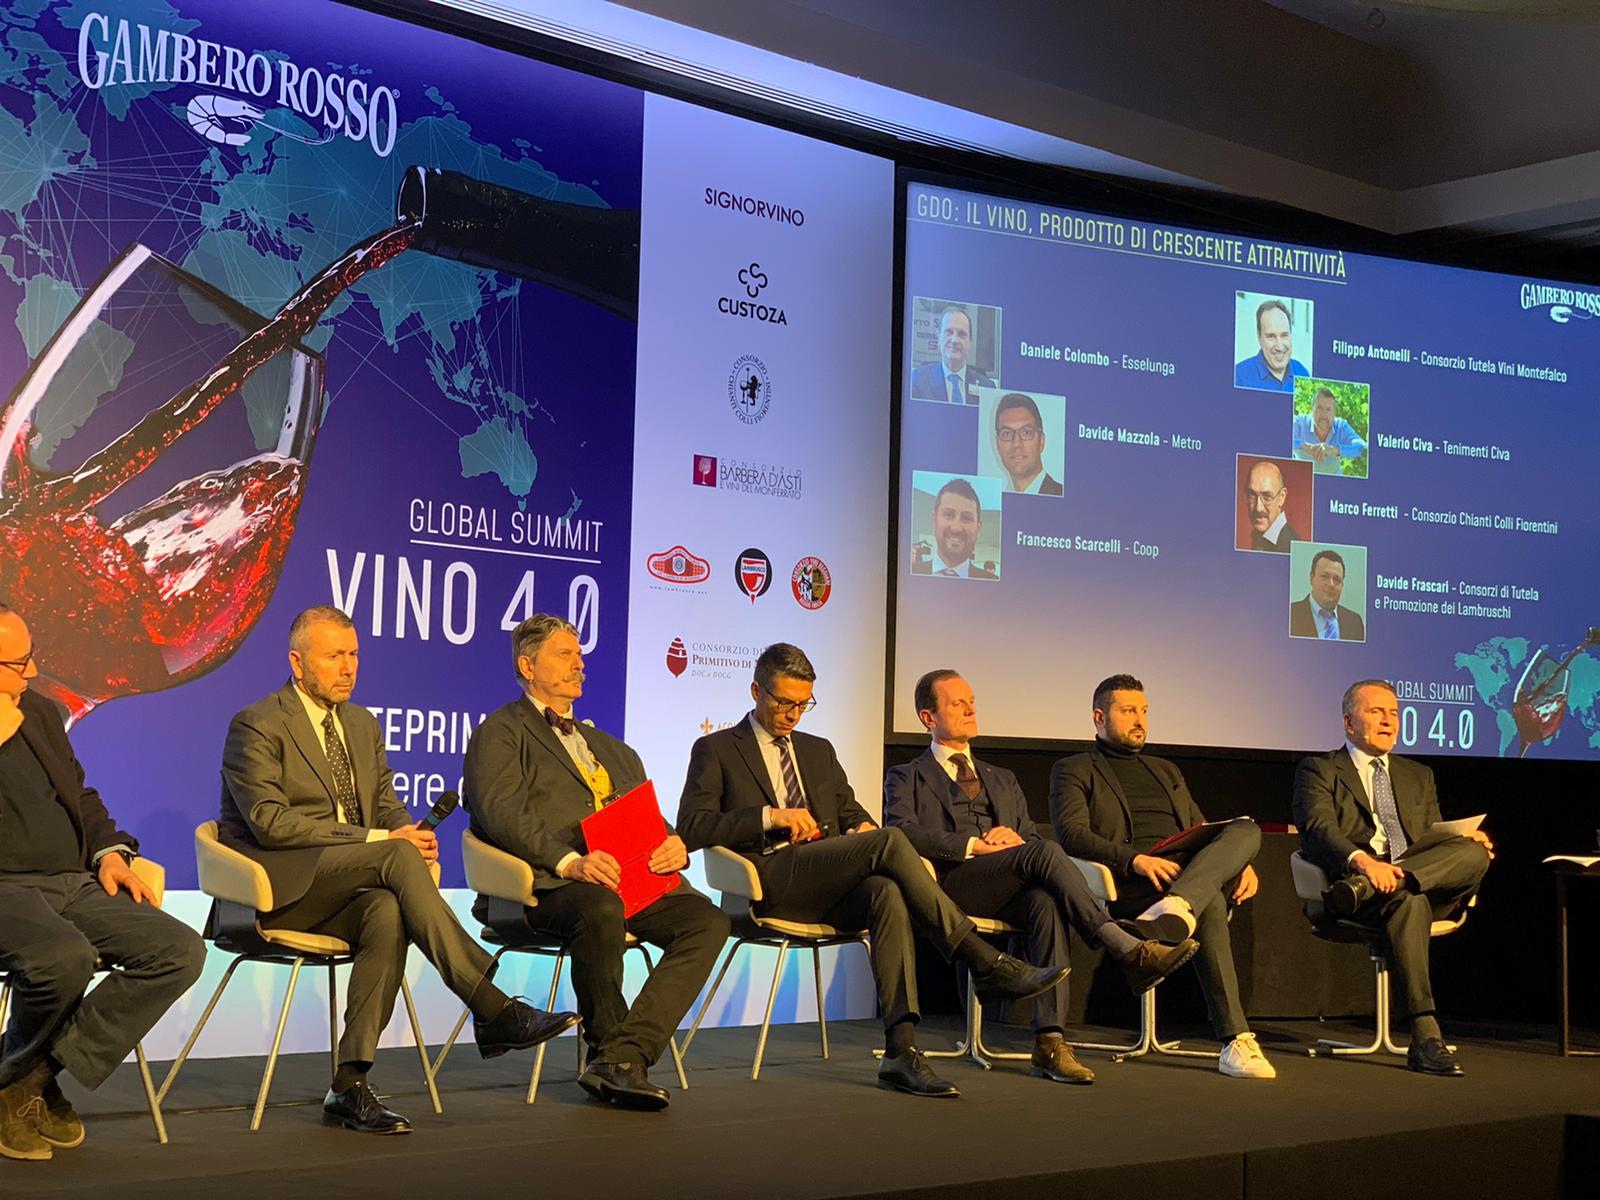 Valerio Civa tra i relatori al Global Summit Vino 4.0